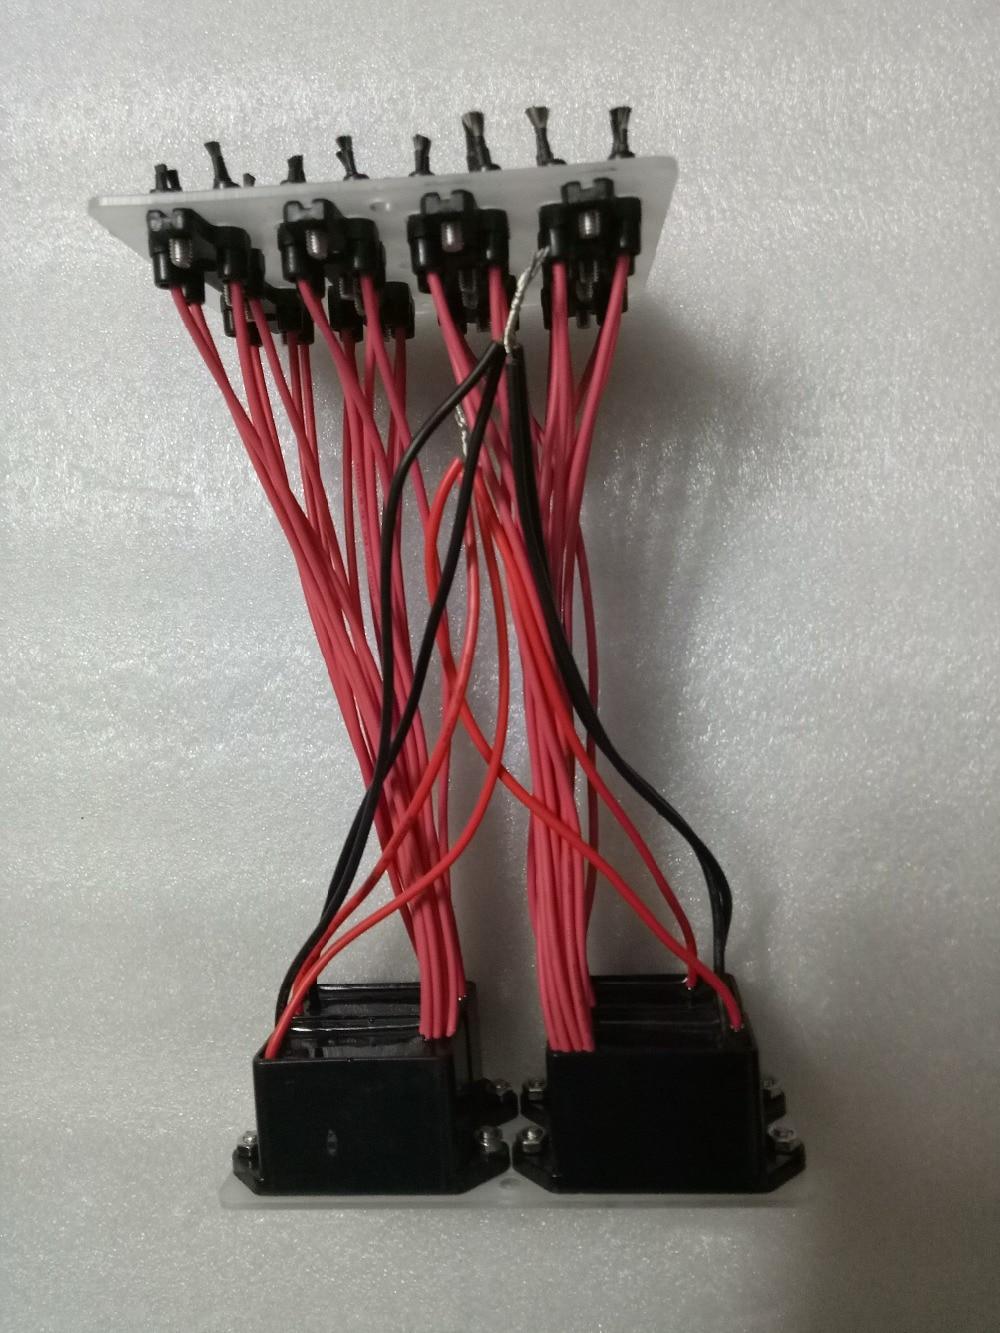 Diy 80/96/112/128 Heads 110V220V Negative Ion Generator Home Ionizer In Addition to Smoke Formaldehyde Odor Purifier